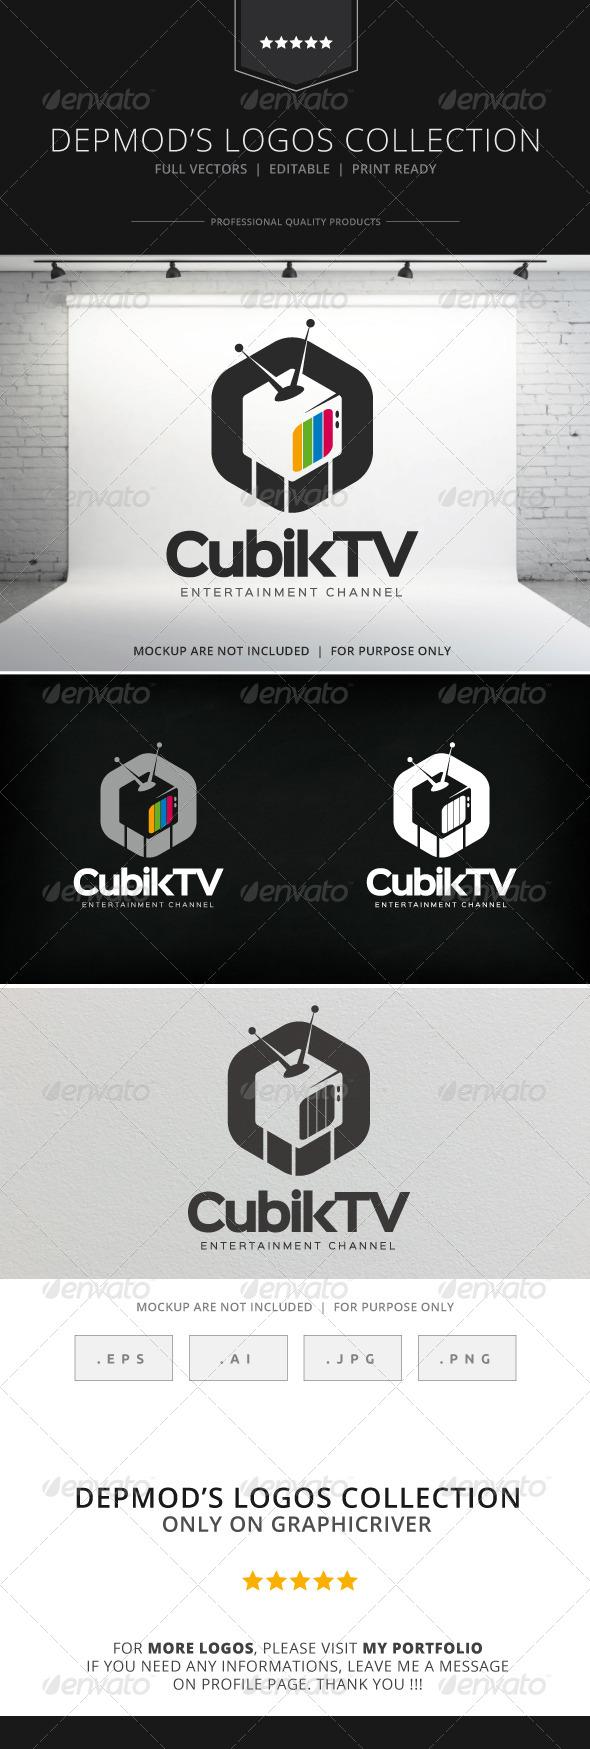 cubik tv logo by opaq